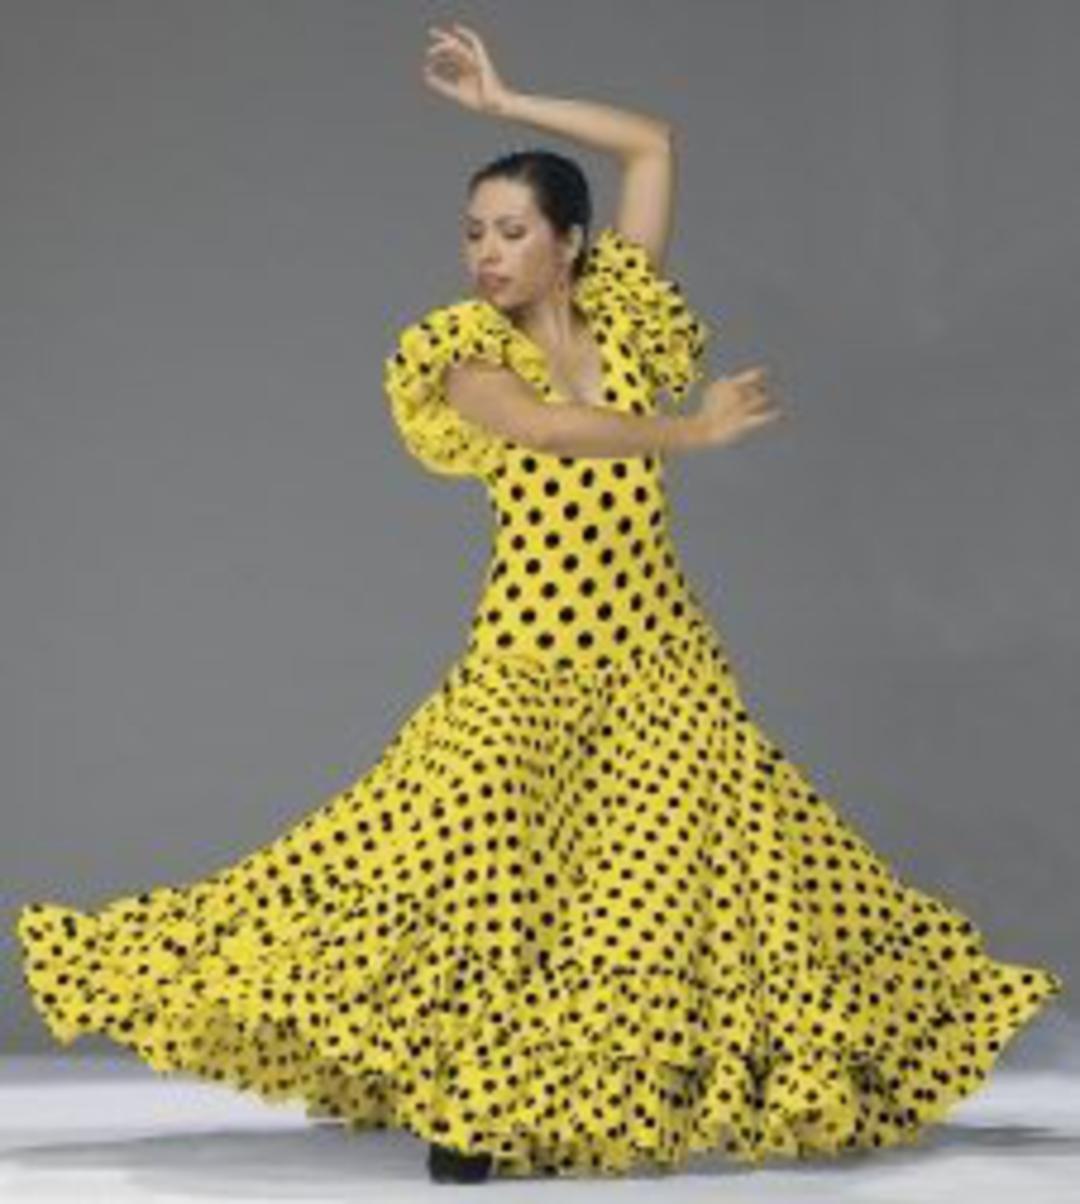 2c151e2b2106 Praisewear, Liturgical dance wear, worship dance attire, liturgical dresses,  christian dance wear in Atlanta, Ga - FL899 Sevillana Flamenco Dress